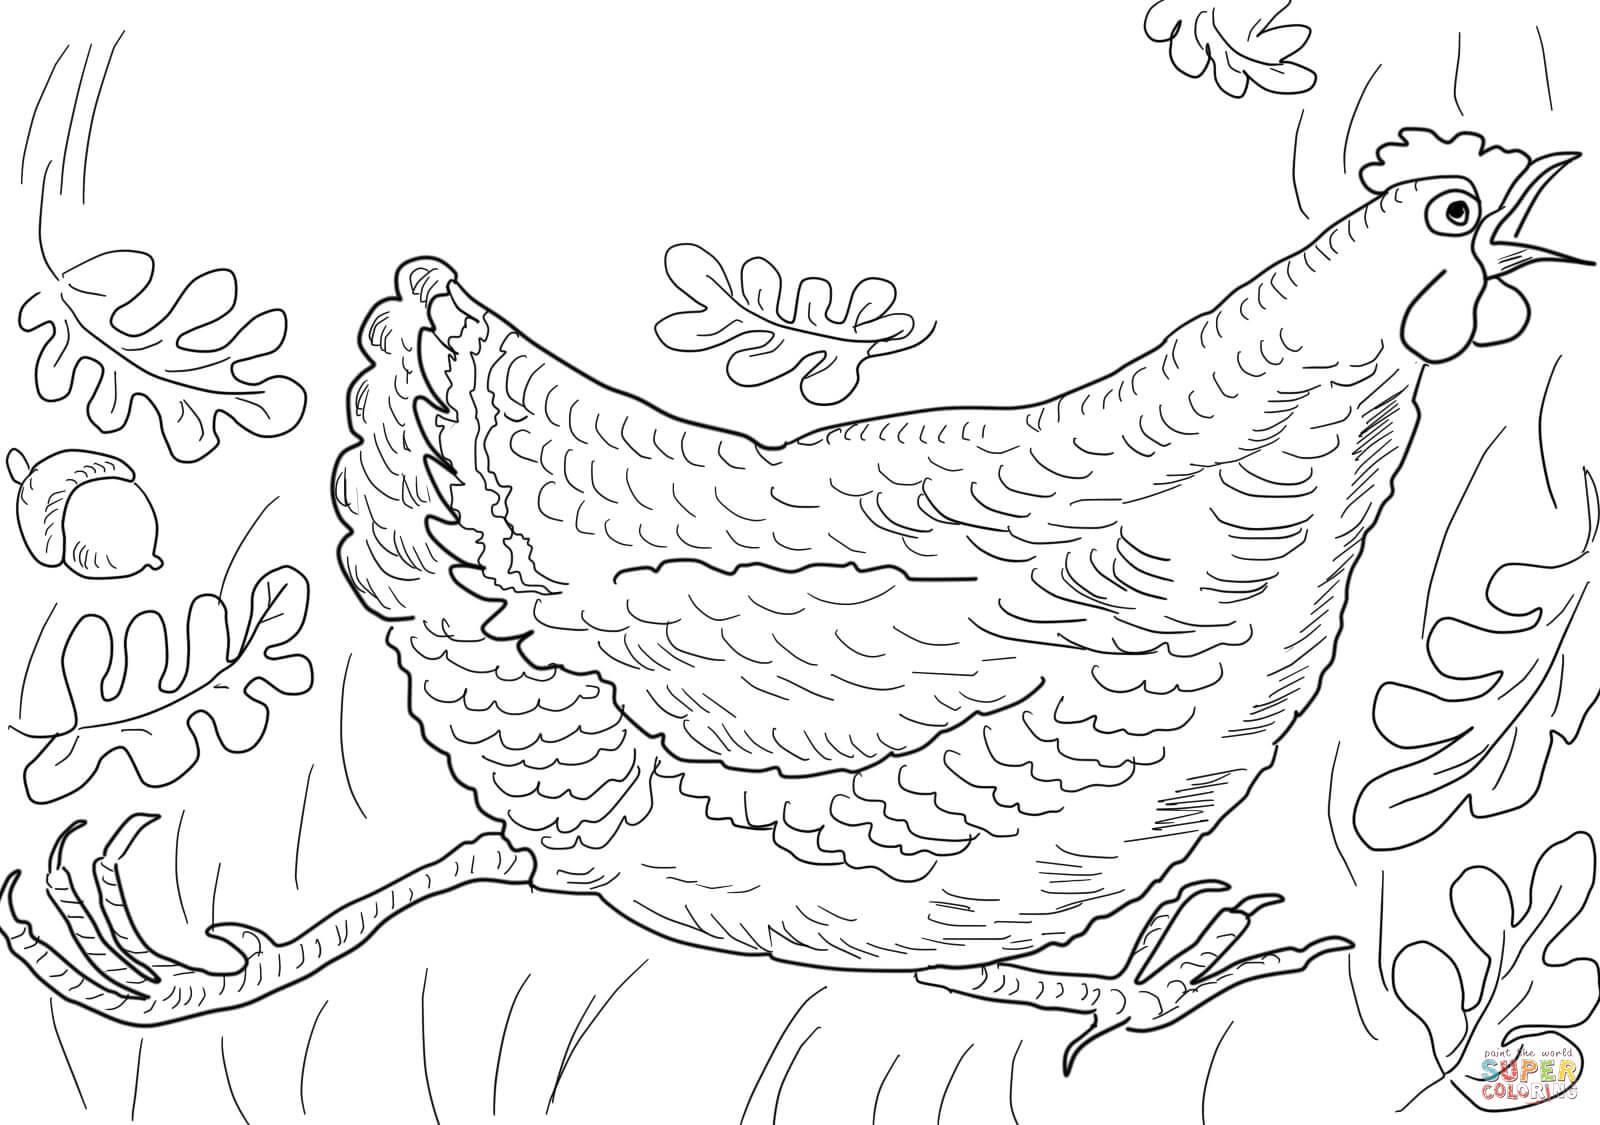 Penny Drawing At Getdrawings